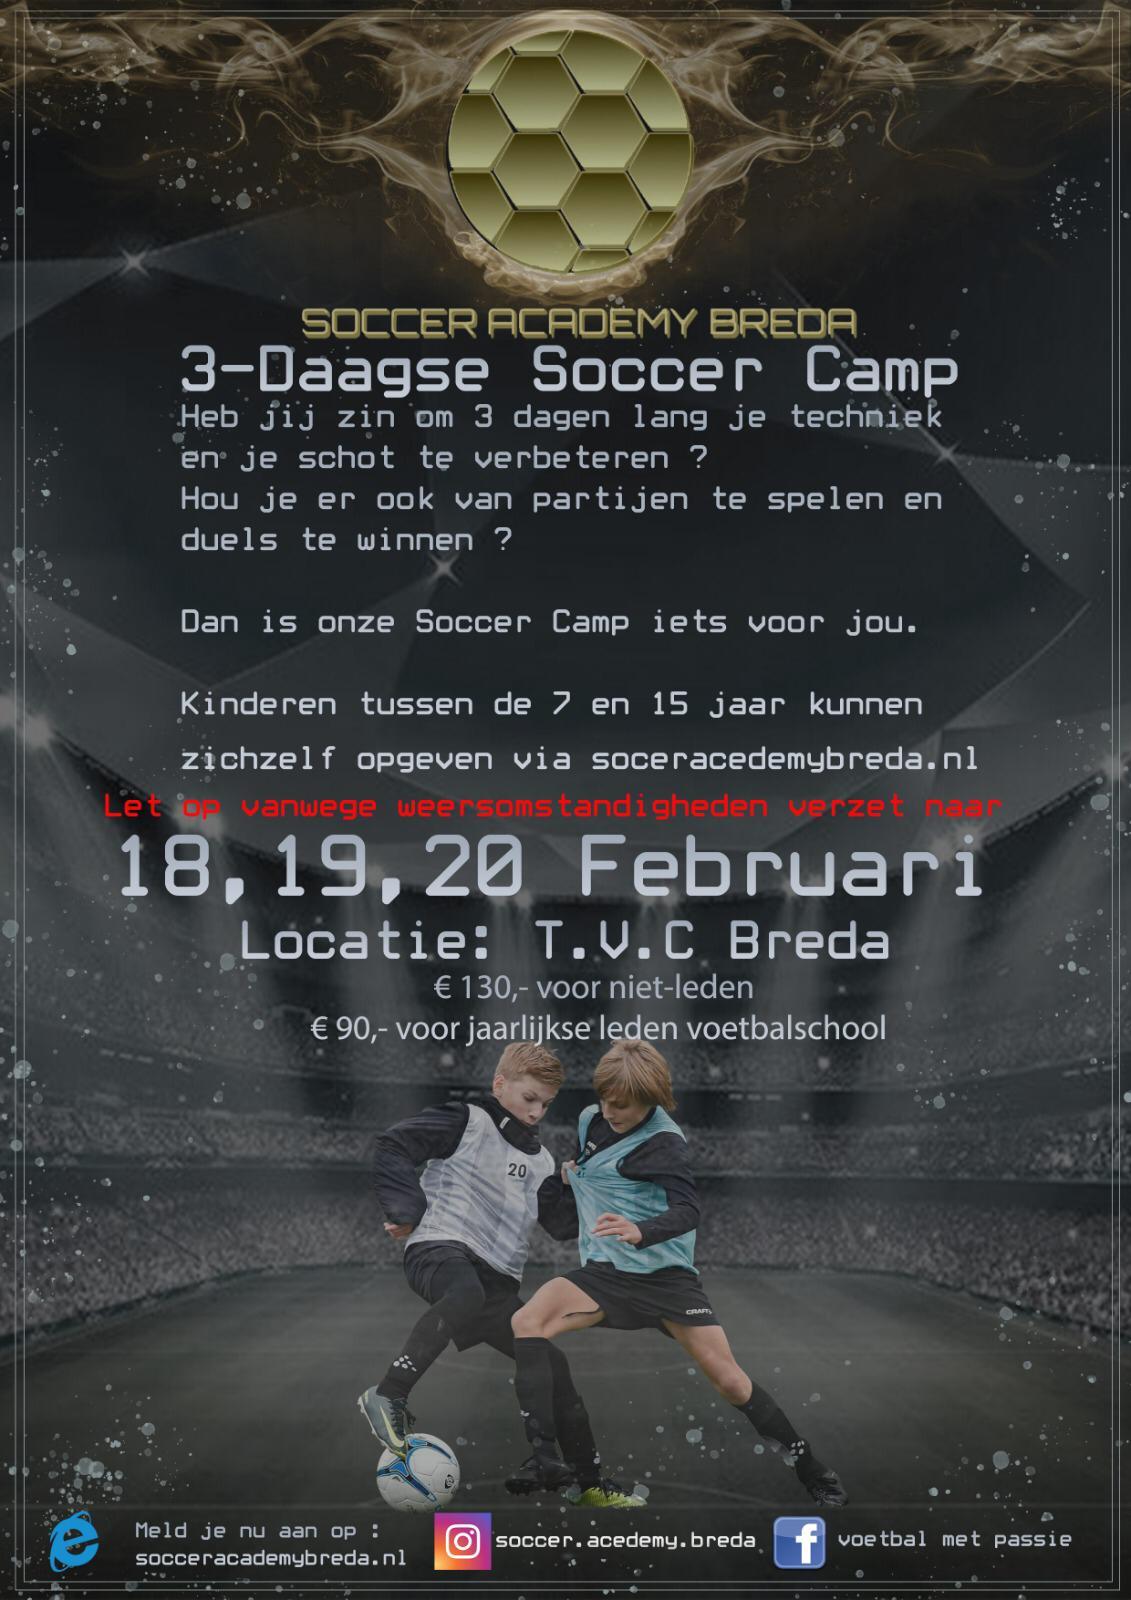 https://socceracademybreda.nl/wp-content/uploads/2021/02/Soccercamp-cnv.jpeg